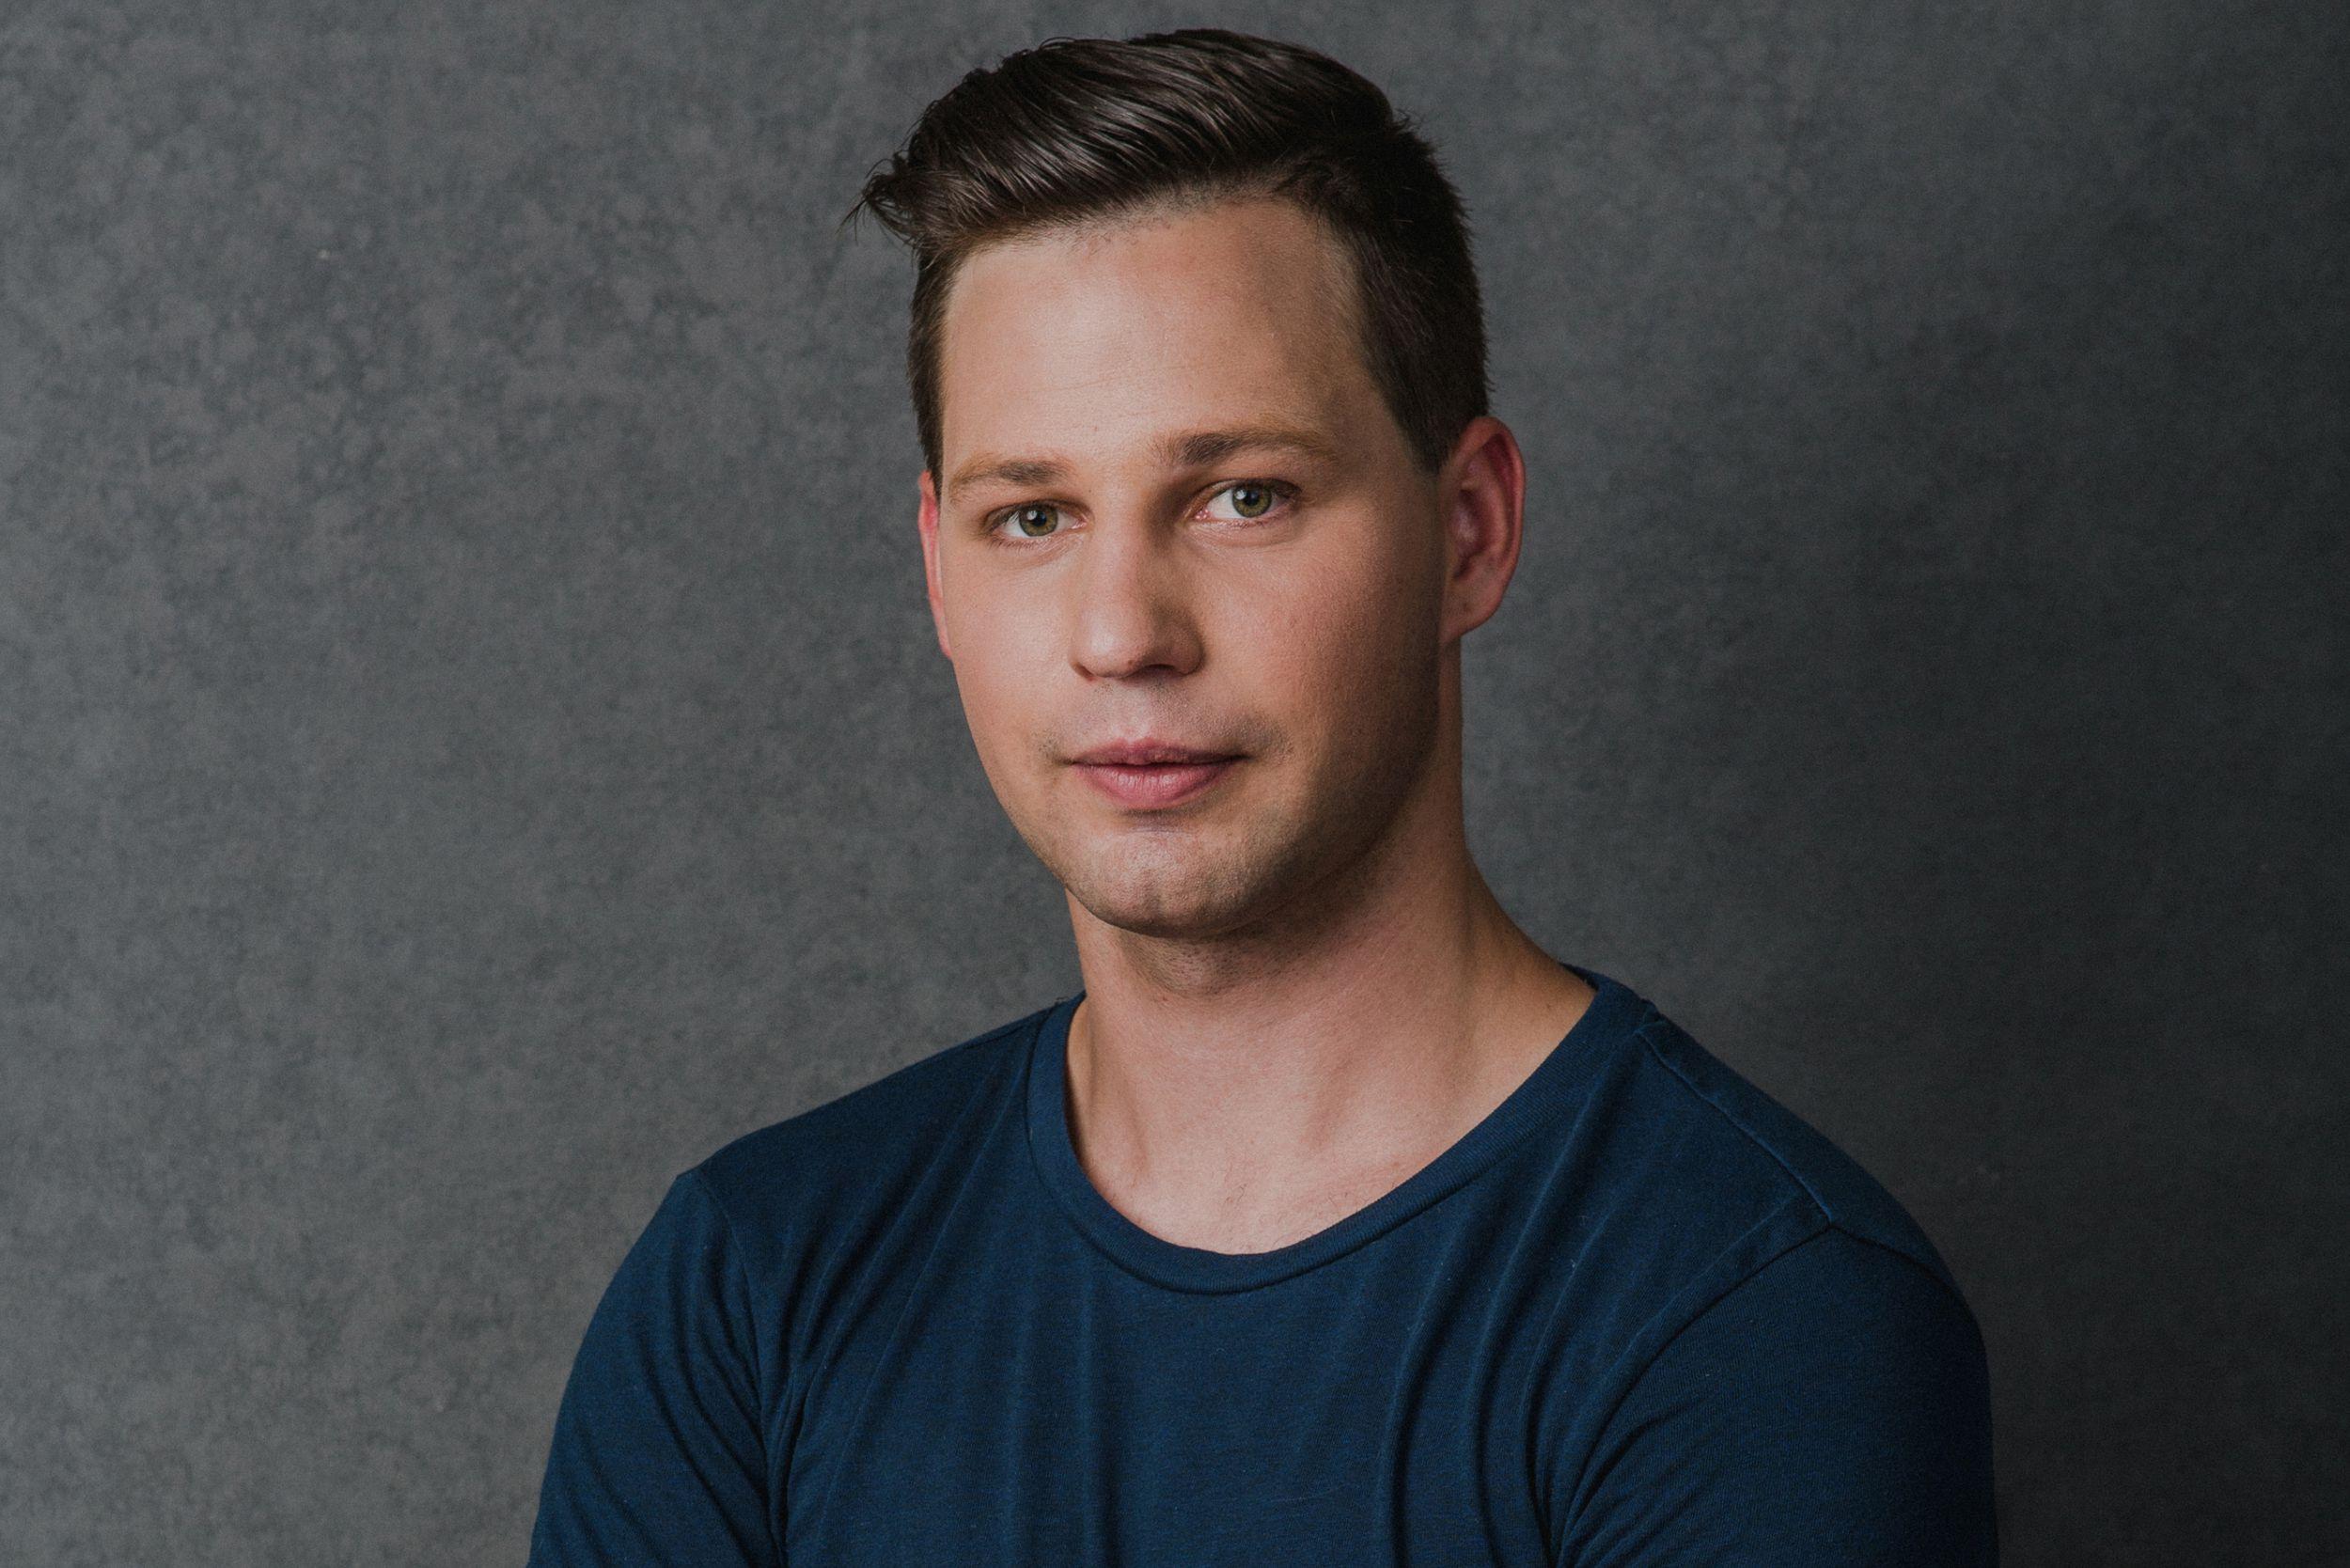 INTERVIEW WITH CINEMATOGRAPHER IGOR PECOLER